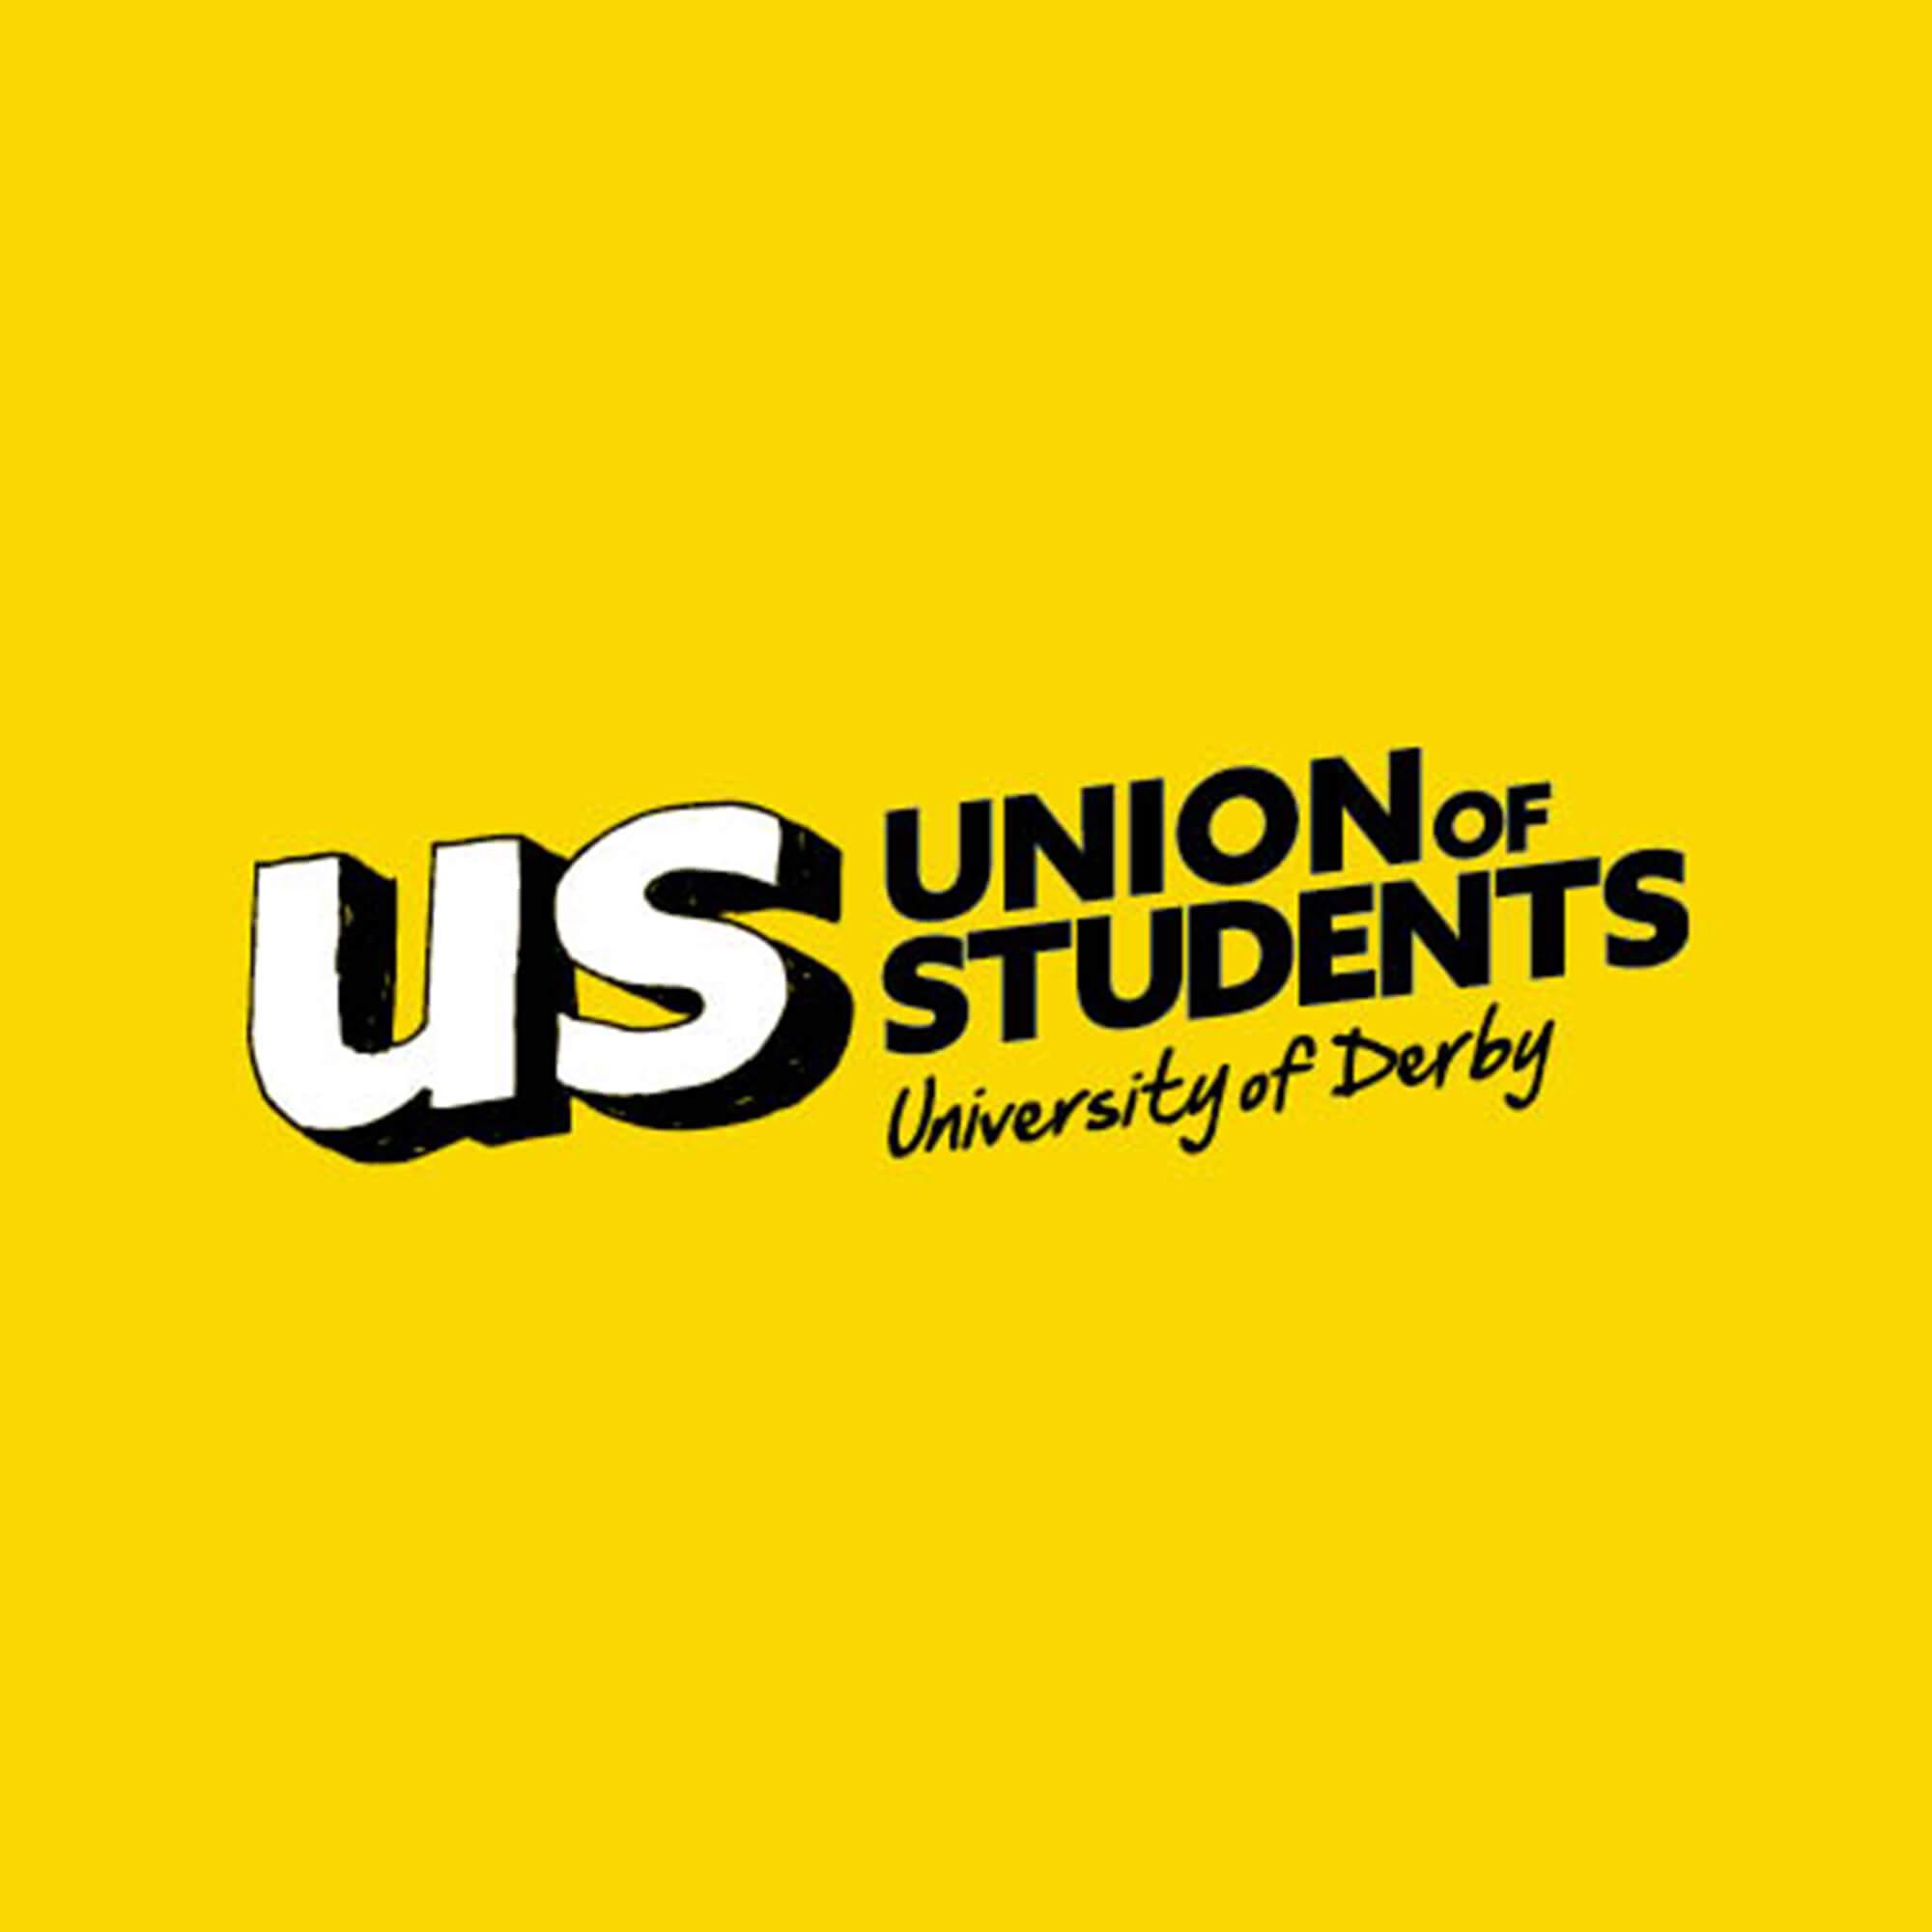 Union of Students logo